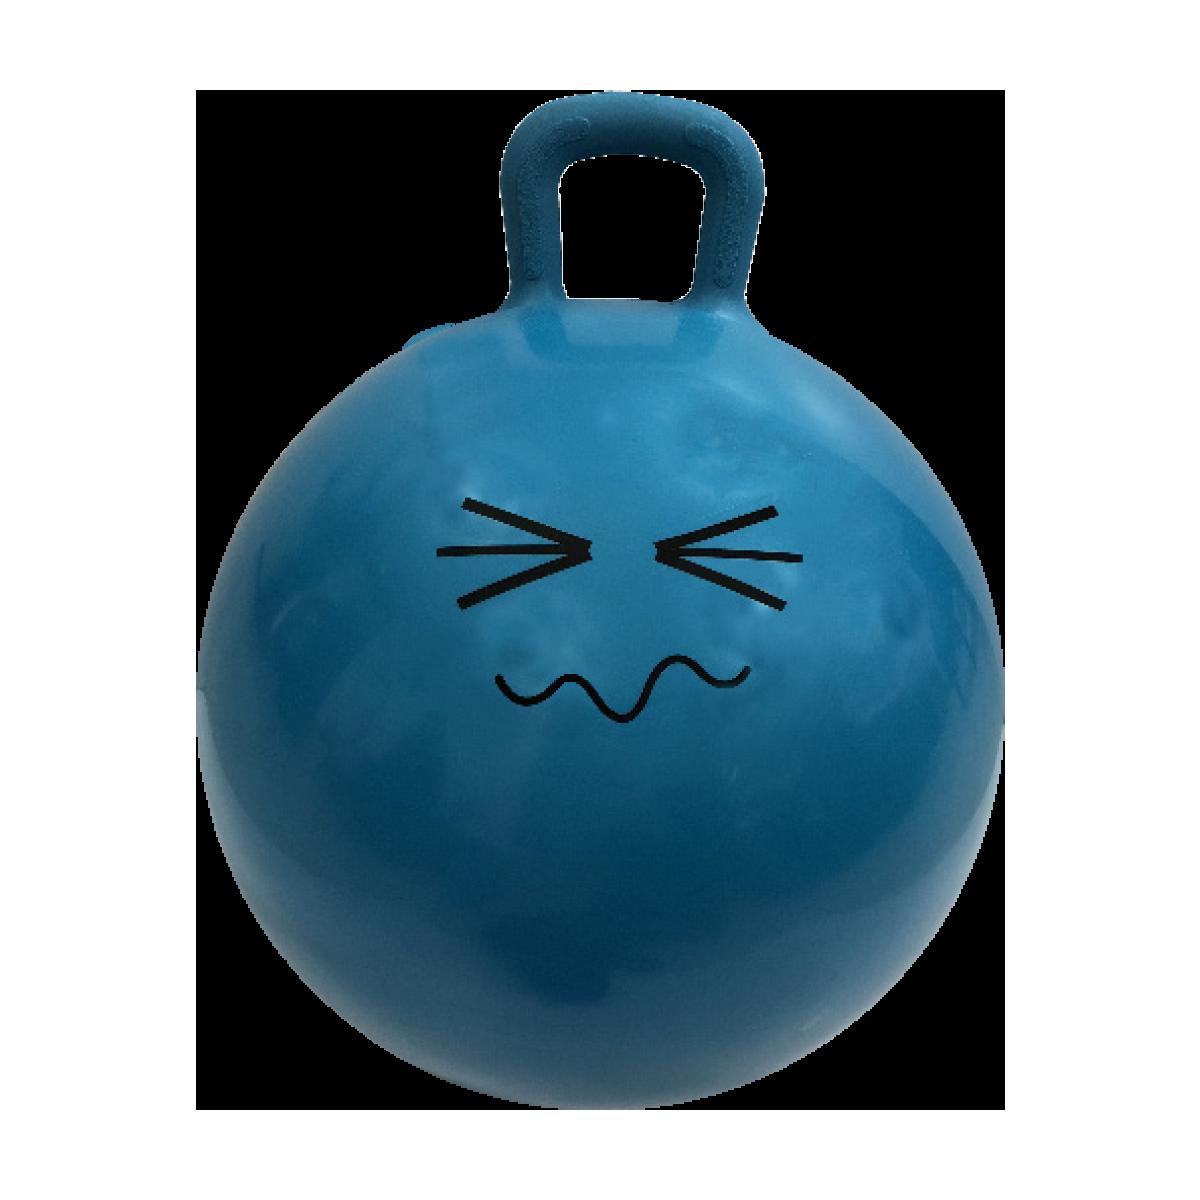 Ballon sauteur-img-402